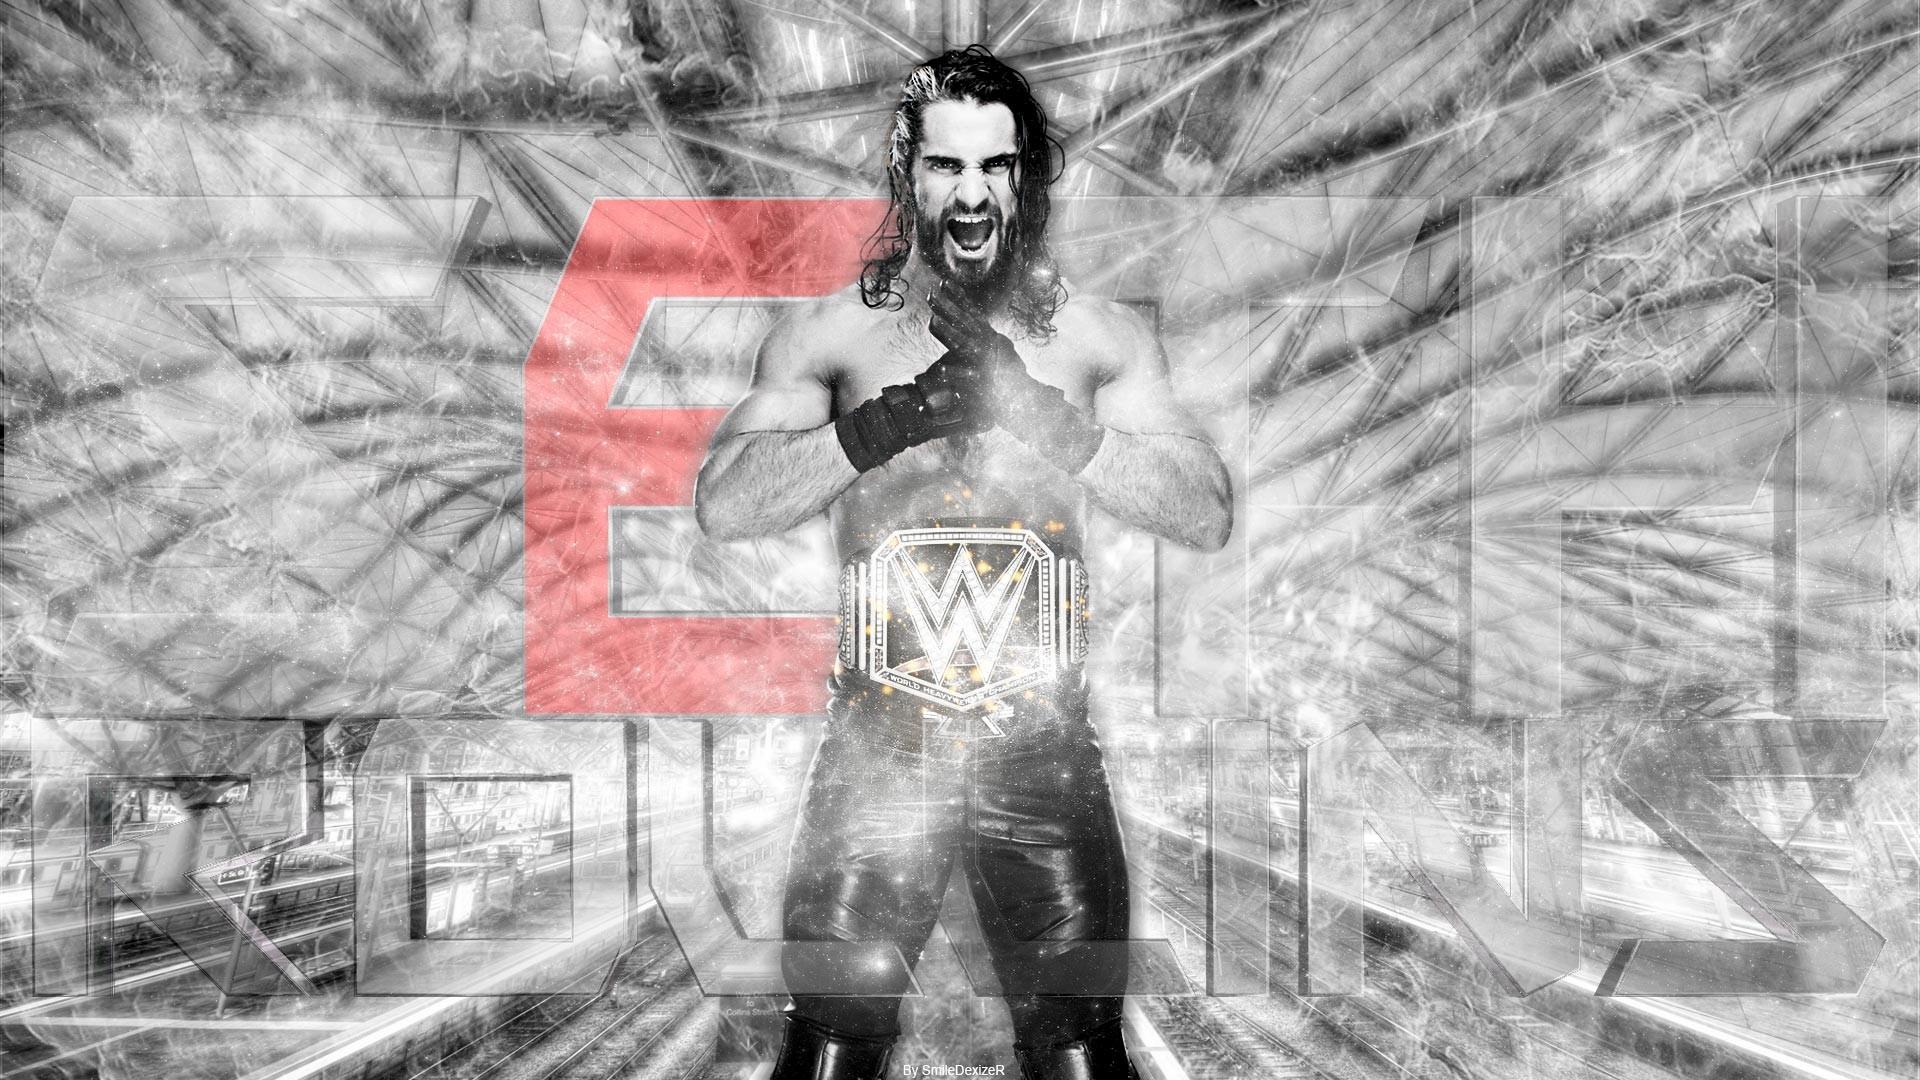 WWE Wrestling Seth Rollins Wallpaper 2015 by SmileDexizeR on .